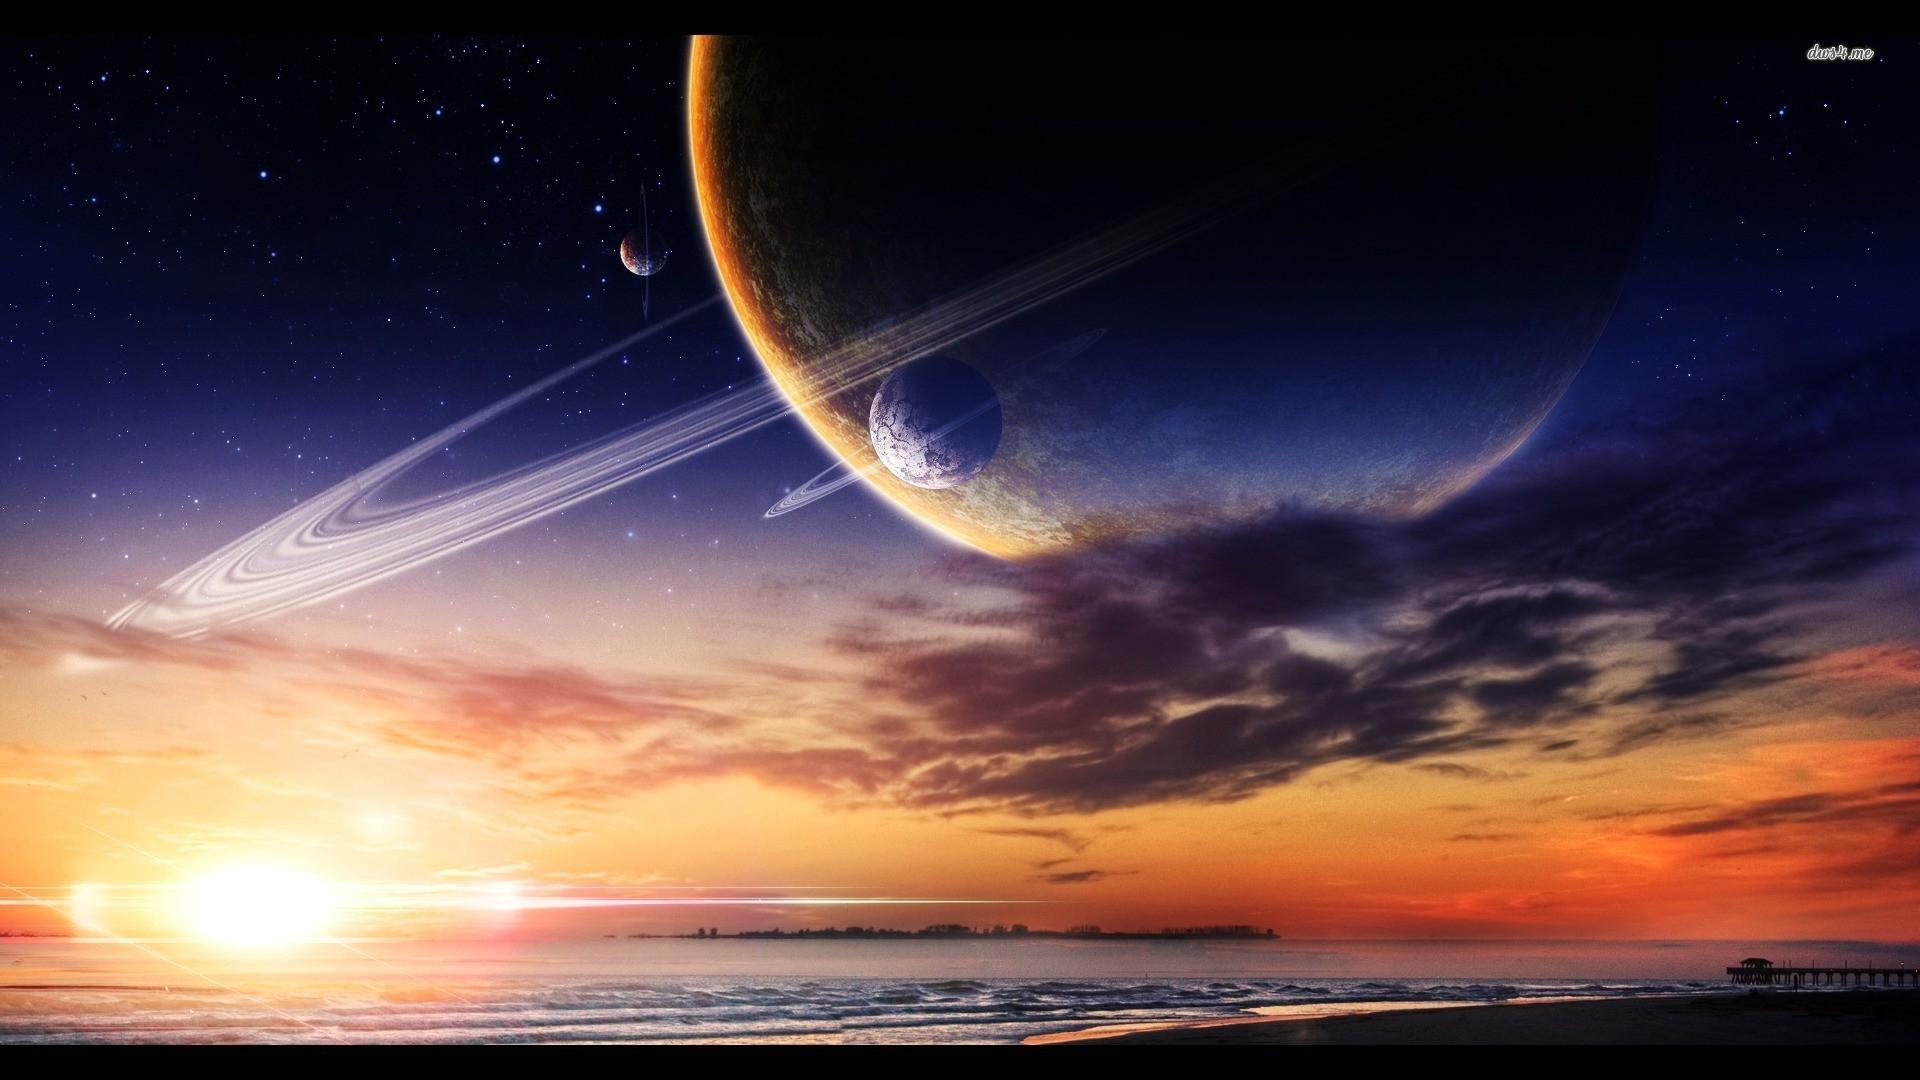 Manipulation cg digital art artistic sci fi science fiction ...